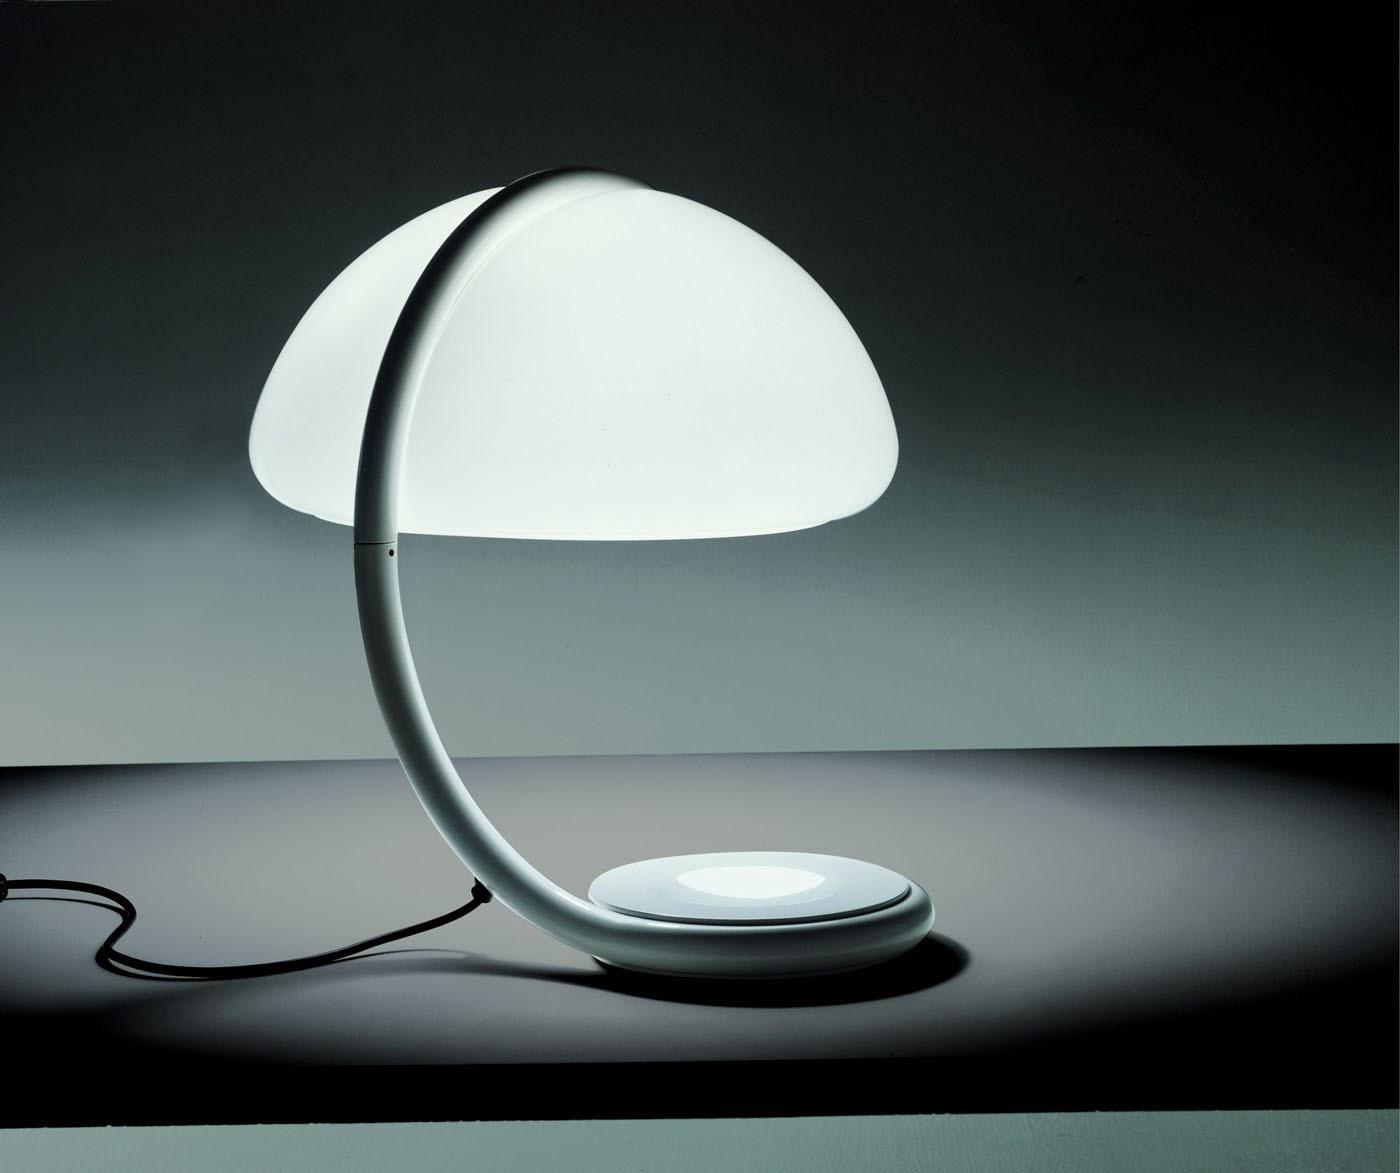 10 Modern Living Room Lighting Ideas 2014 Part 10